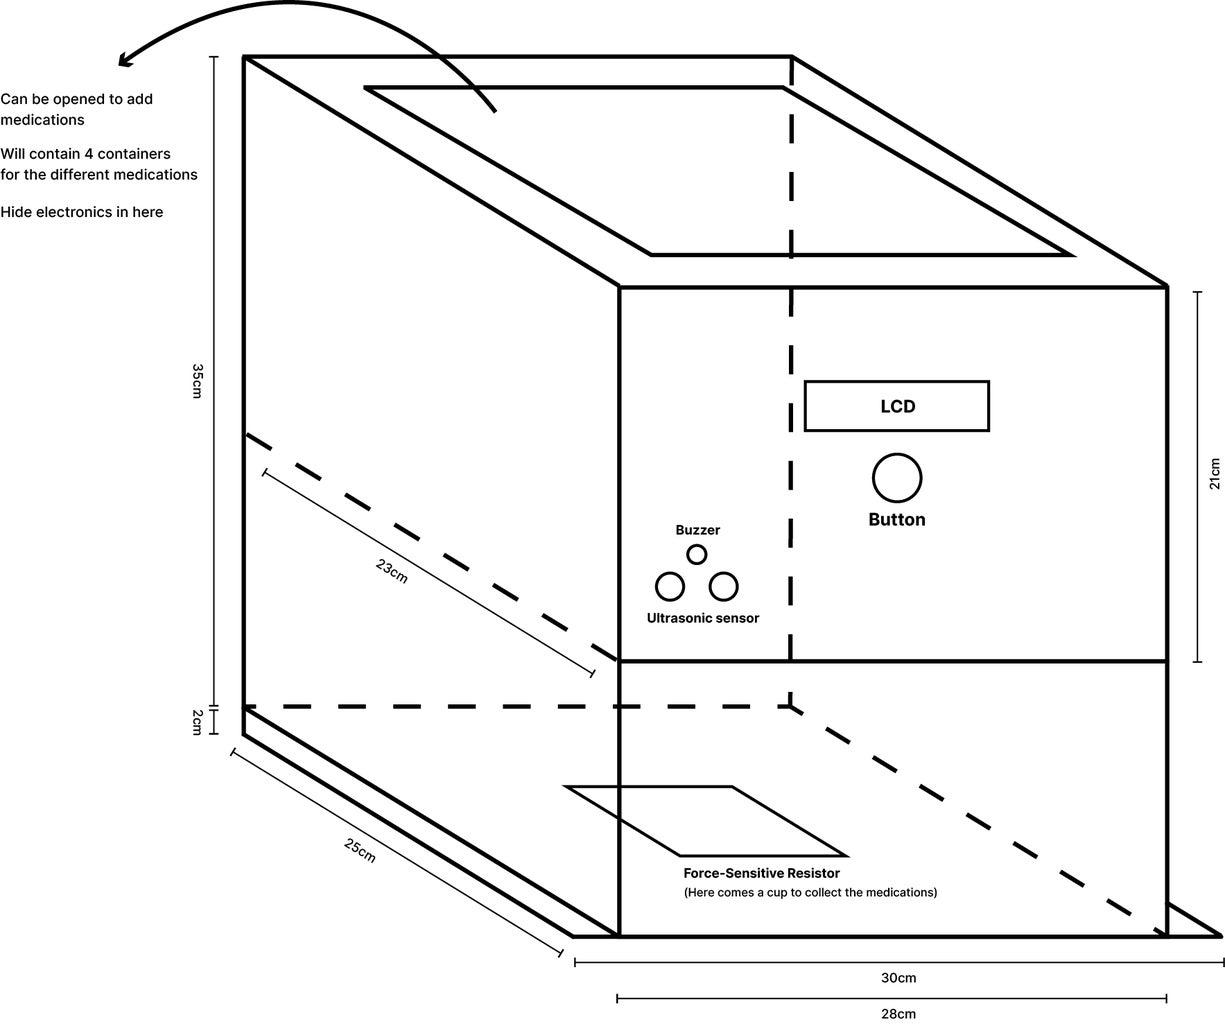 Building the Dispenser